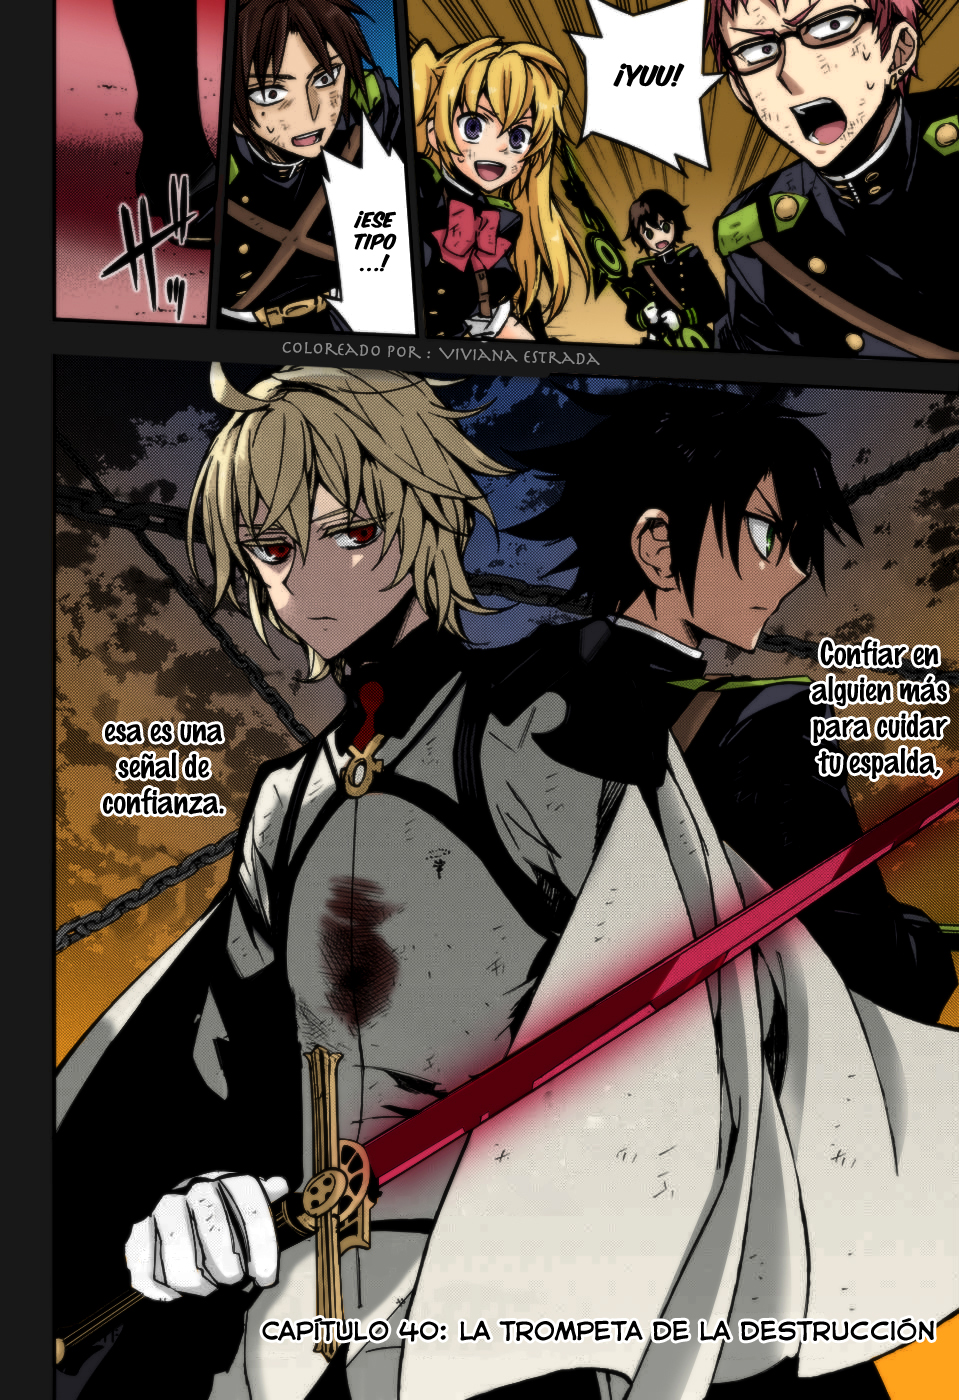 http://c5.ninemanga.com/es_manga/49/3057/432749/91695dc00bccc36deb3f97431368f380.jpg Page 5